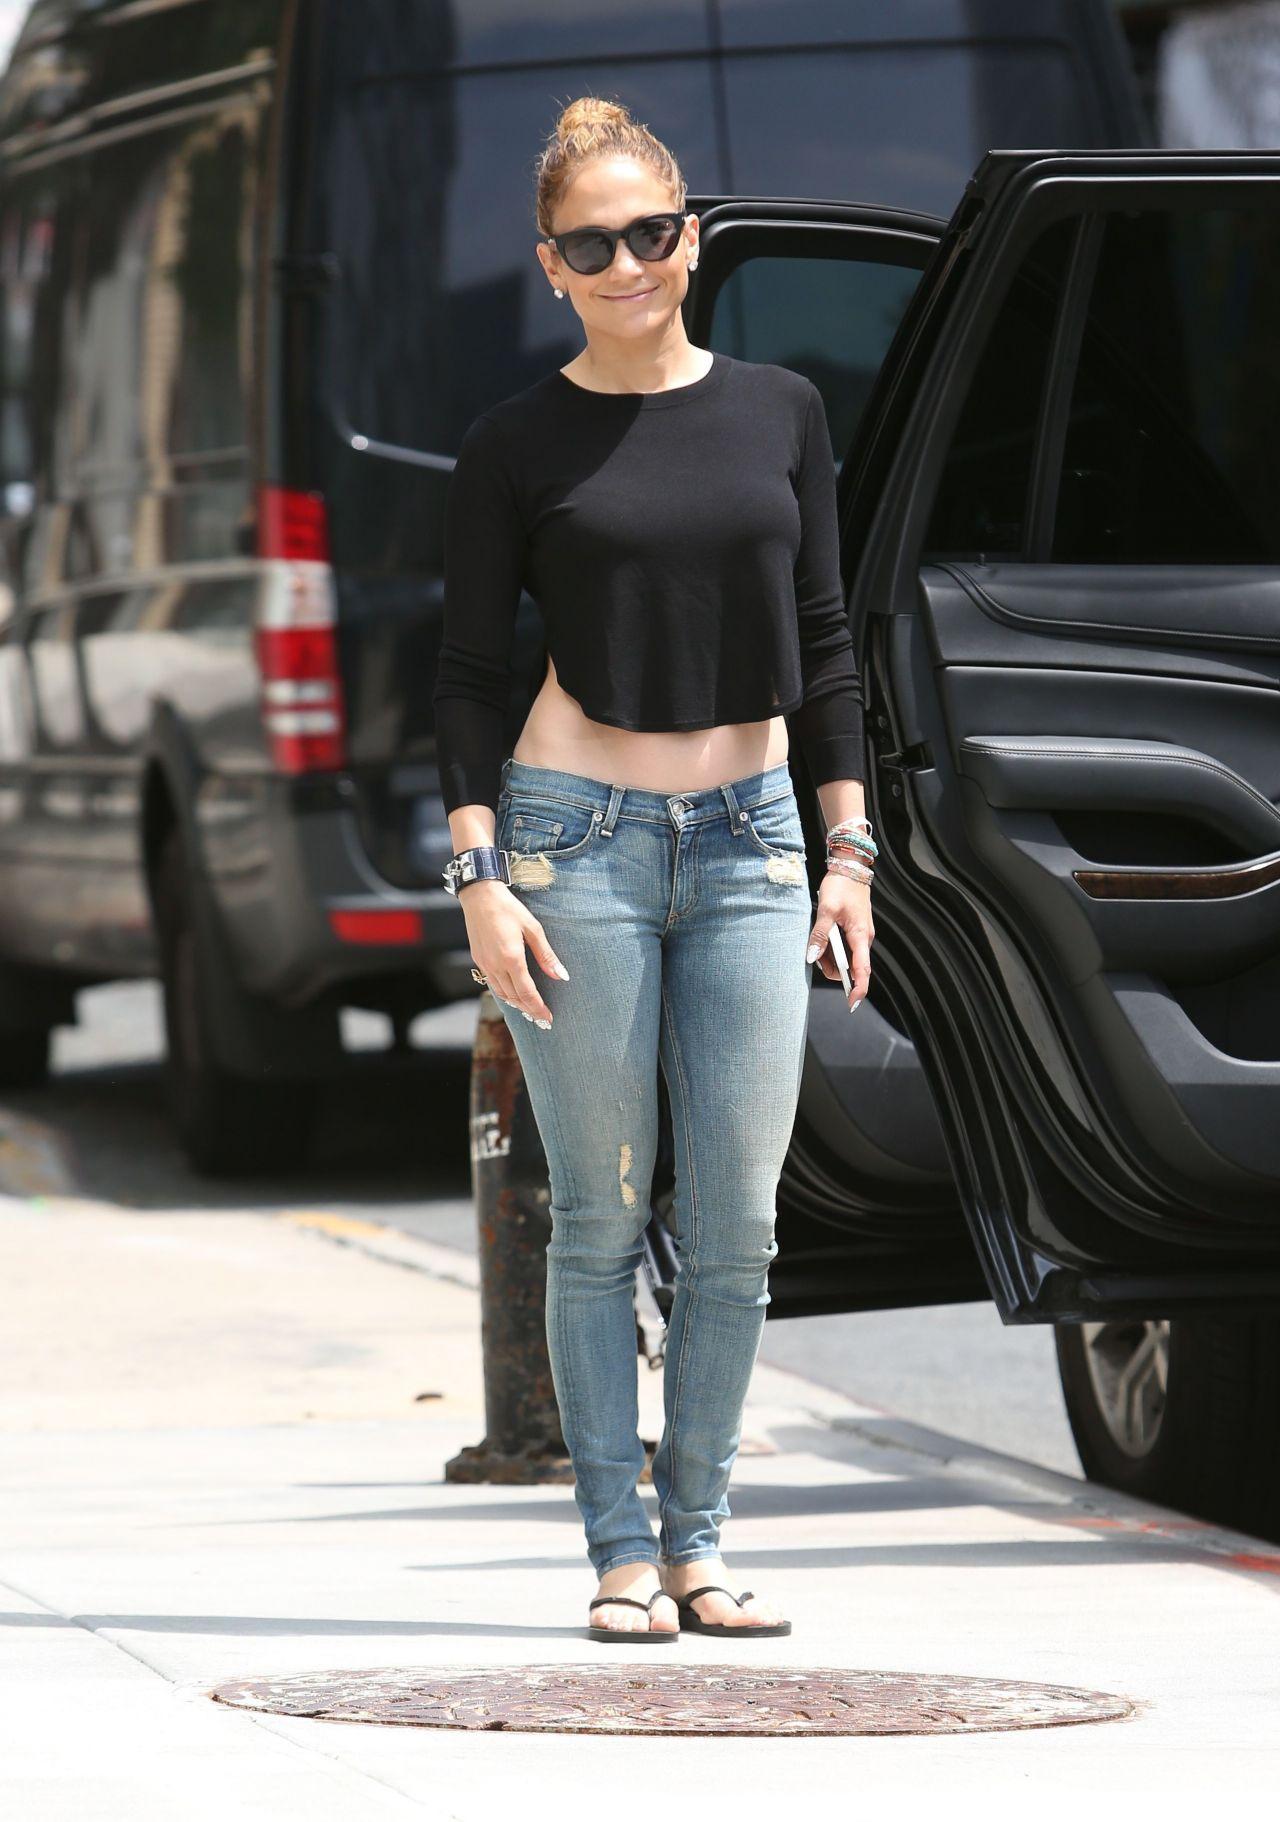 Red Women Jeans